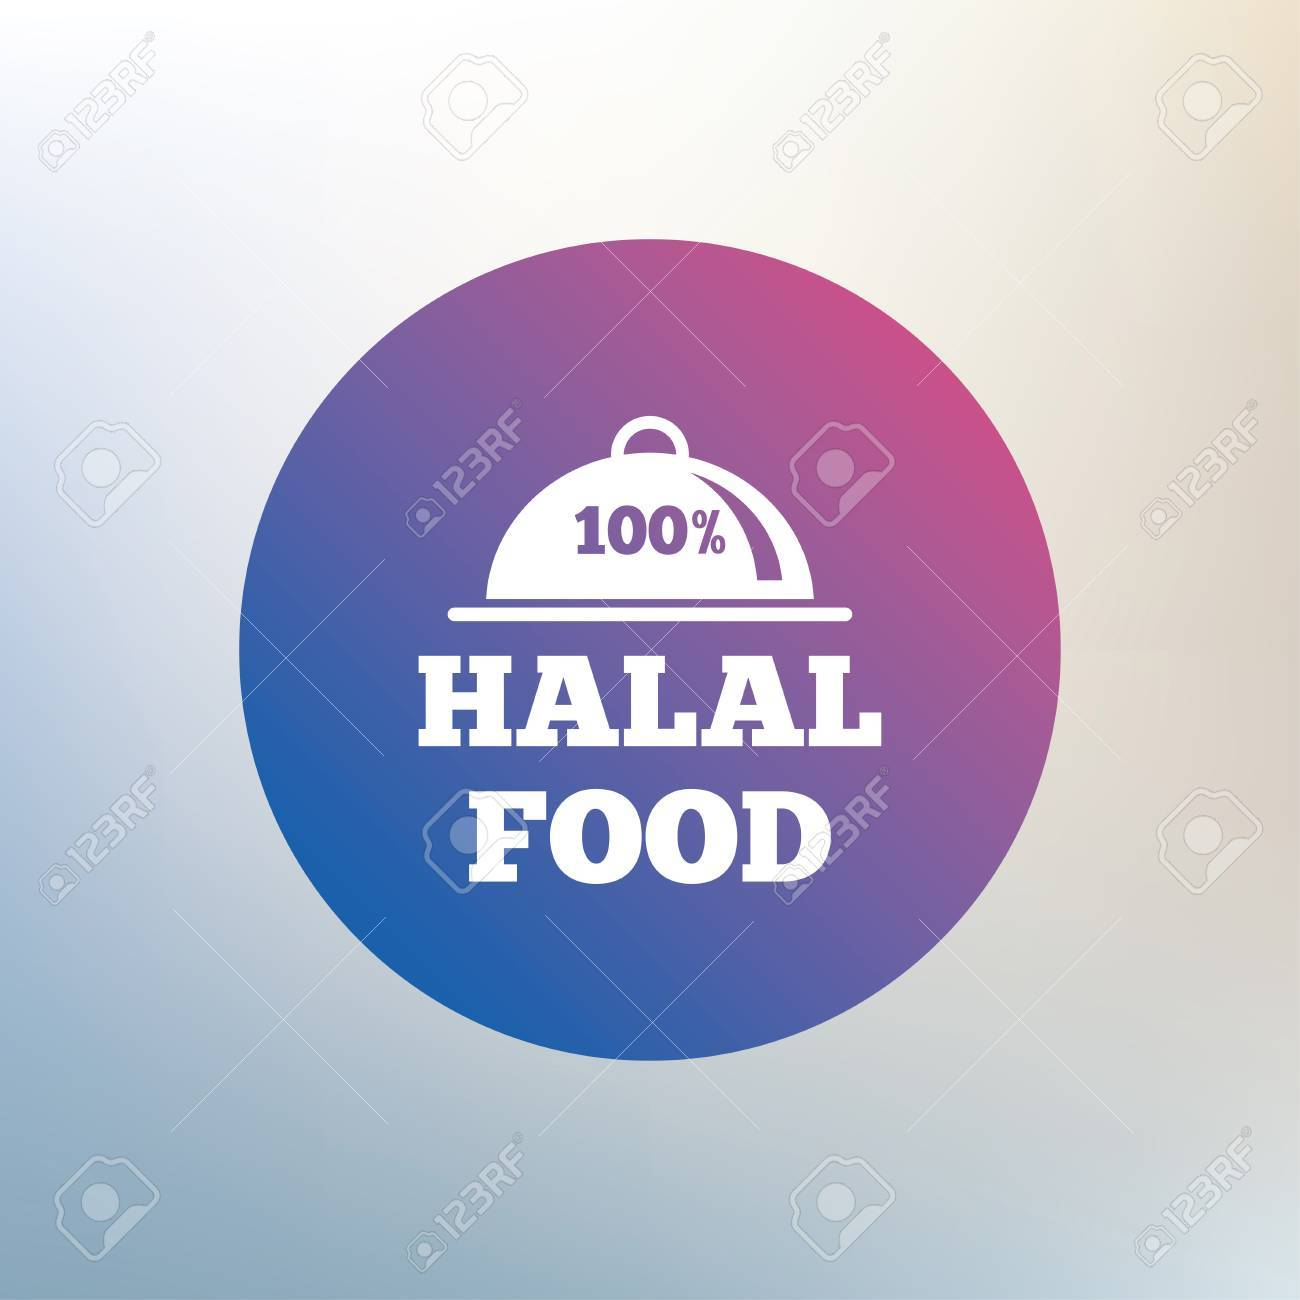 100 halal food product sign icon natural muslims food symbol 100 halal food product sign icon natural muslims food symbol icon on blurred buycottarizona